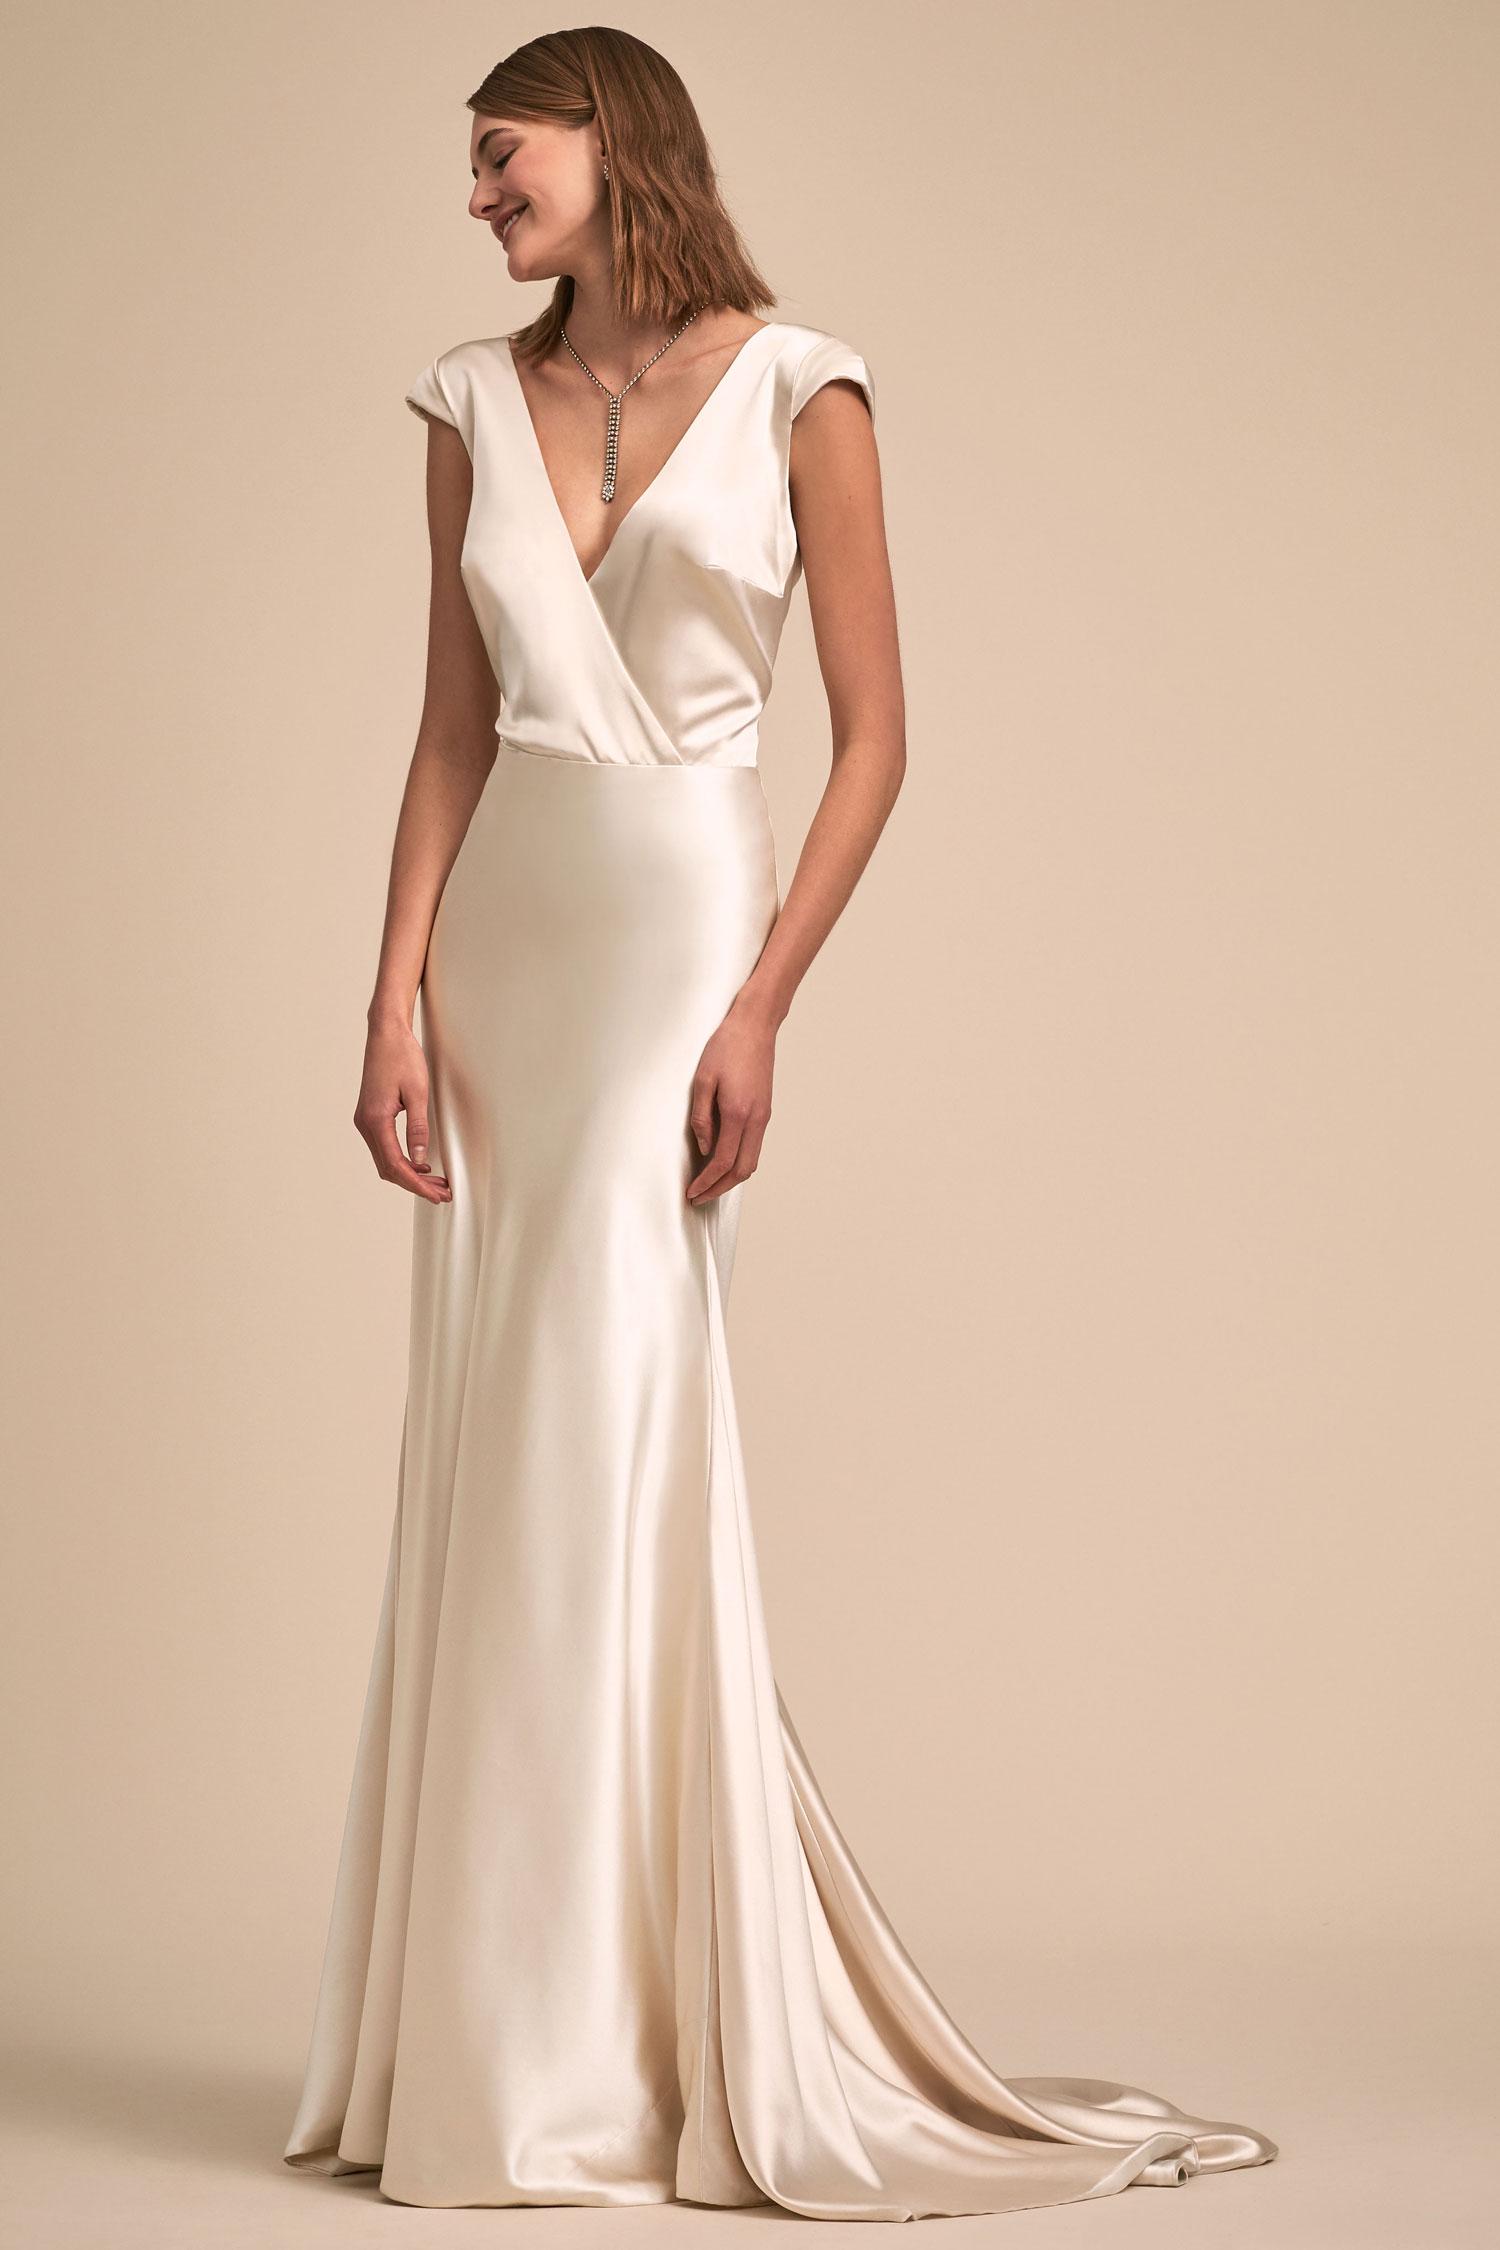 BHLDN The Designer Collective Nevis by Johanna Johnson silk wedding dress cap sleeves